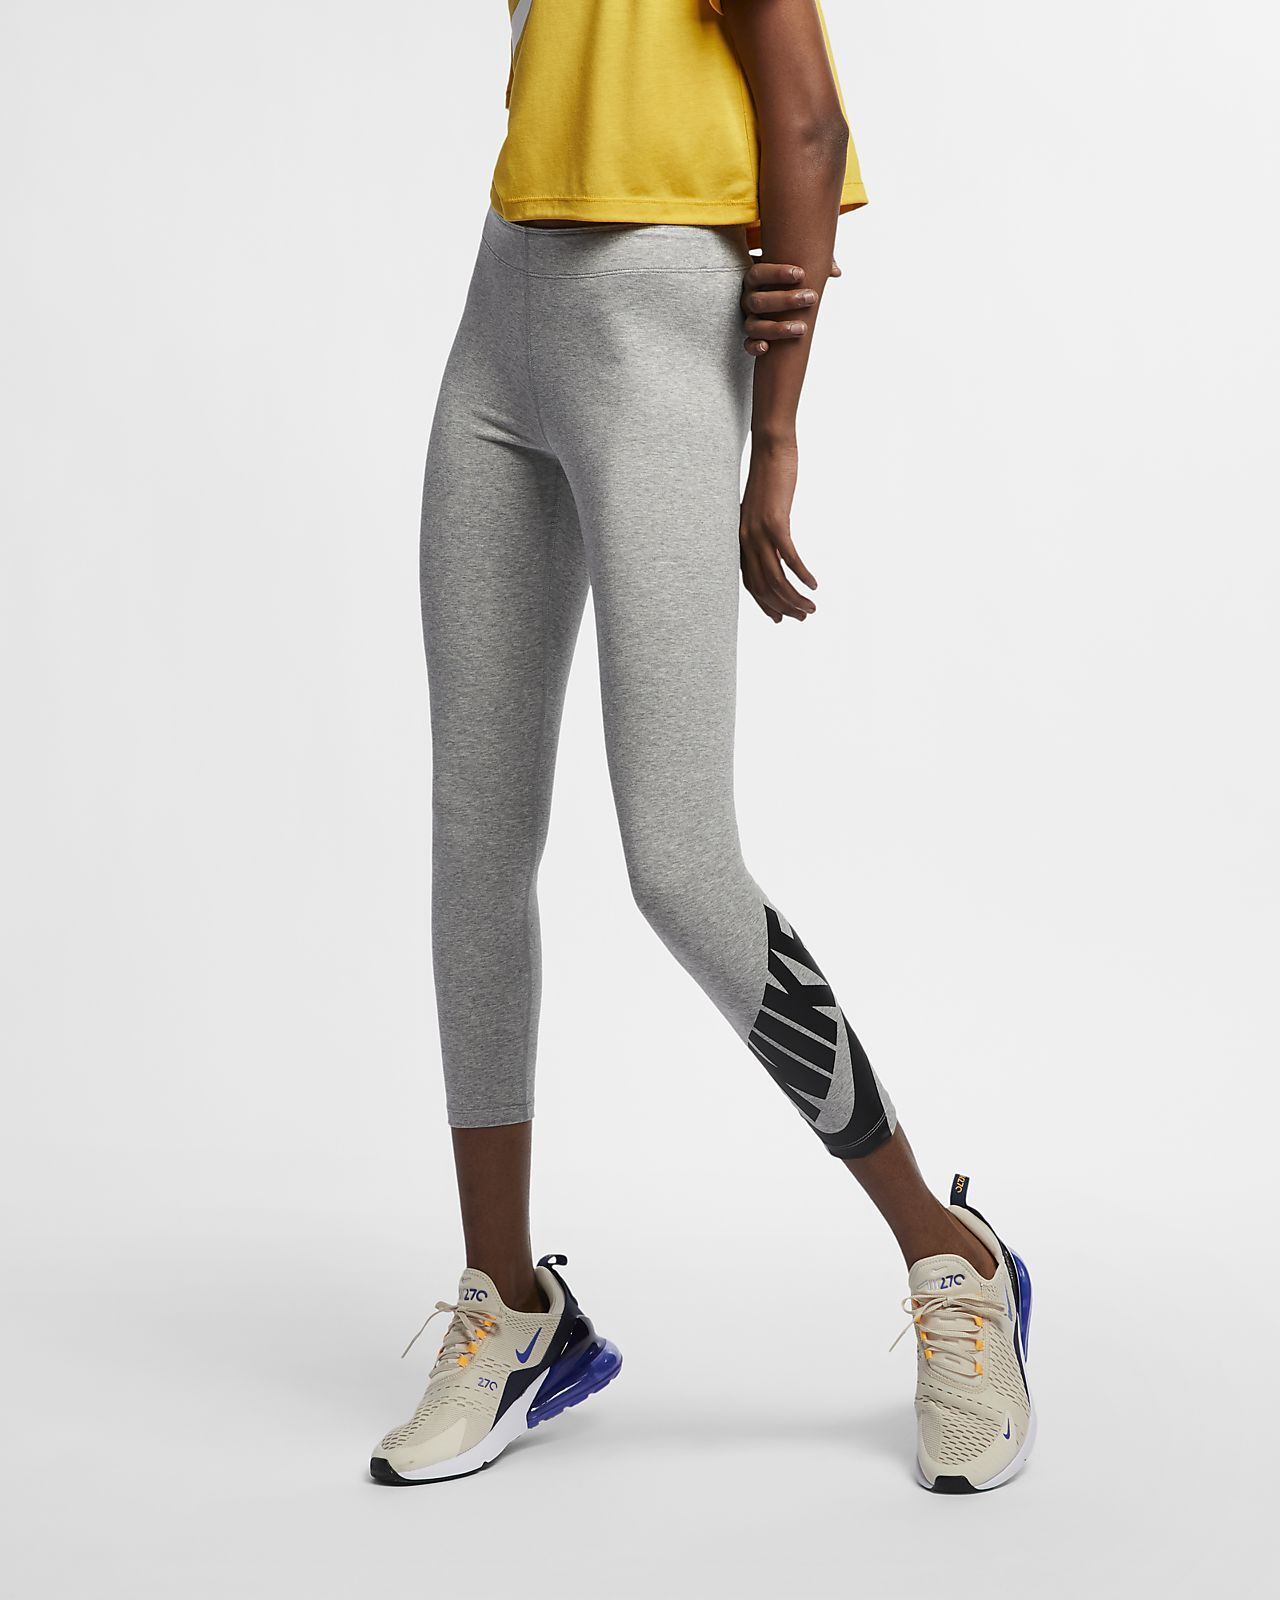 8bec35a26c1 Nike Sportswear Leg-A-See 7/8-legging voor dames. Nike.com BE